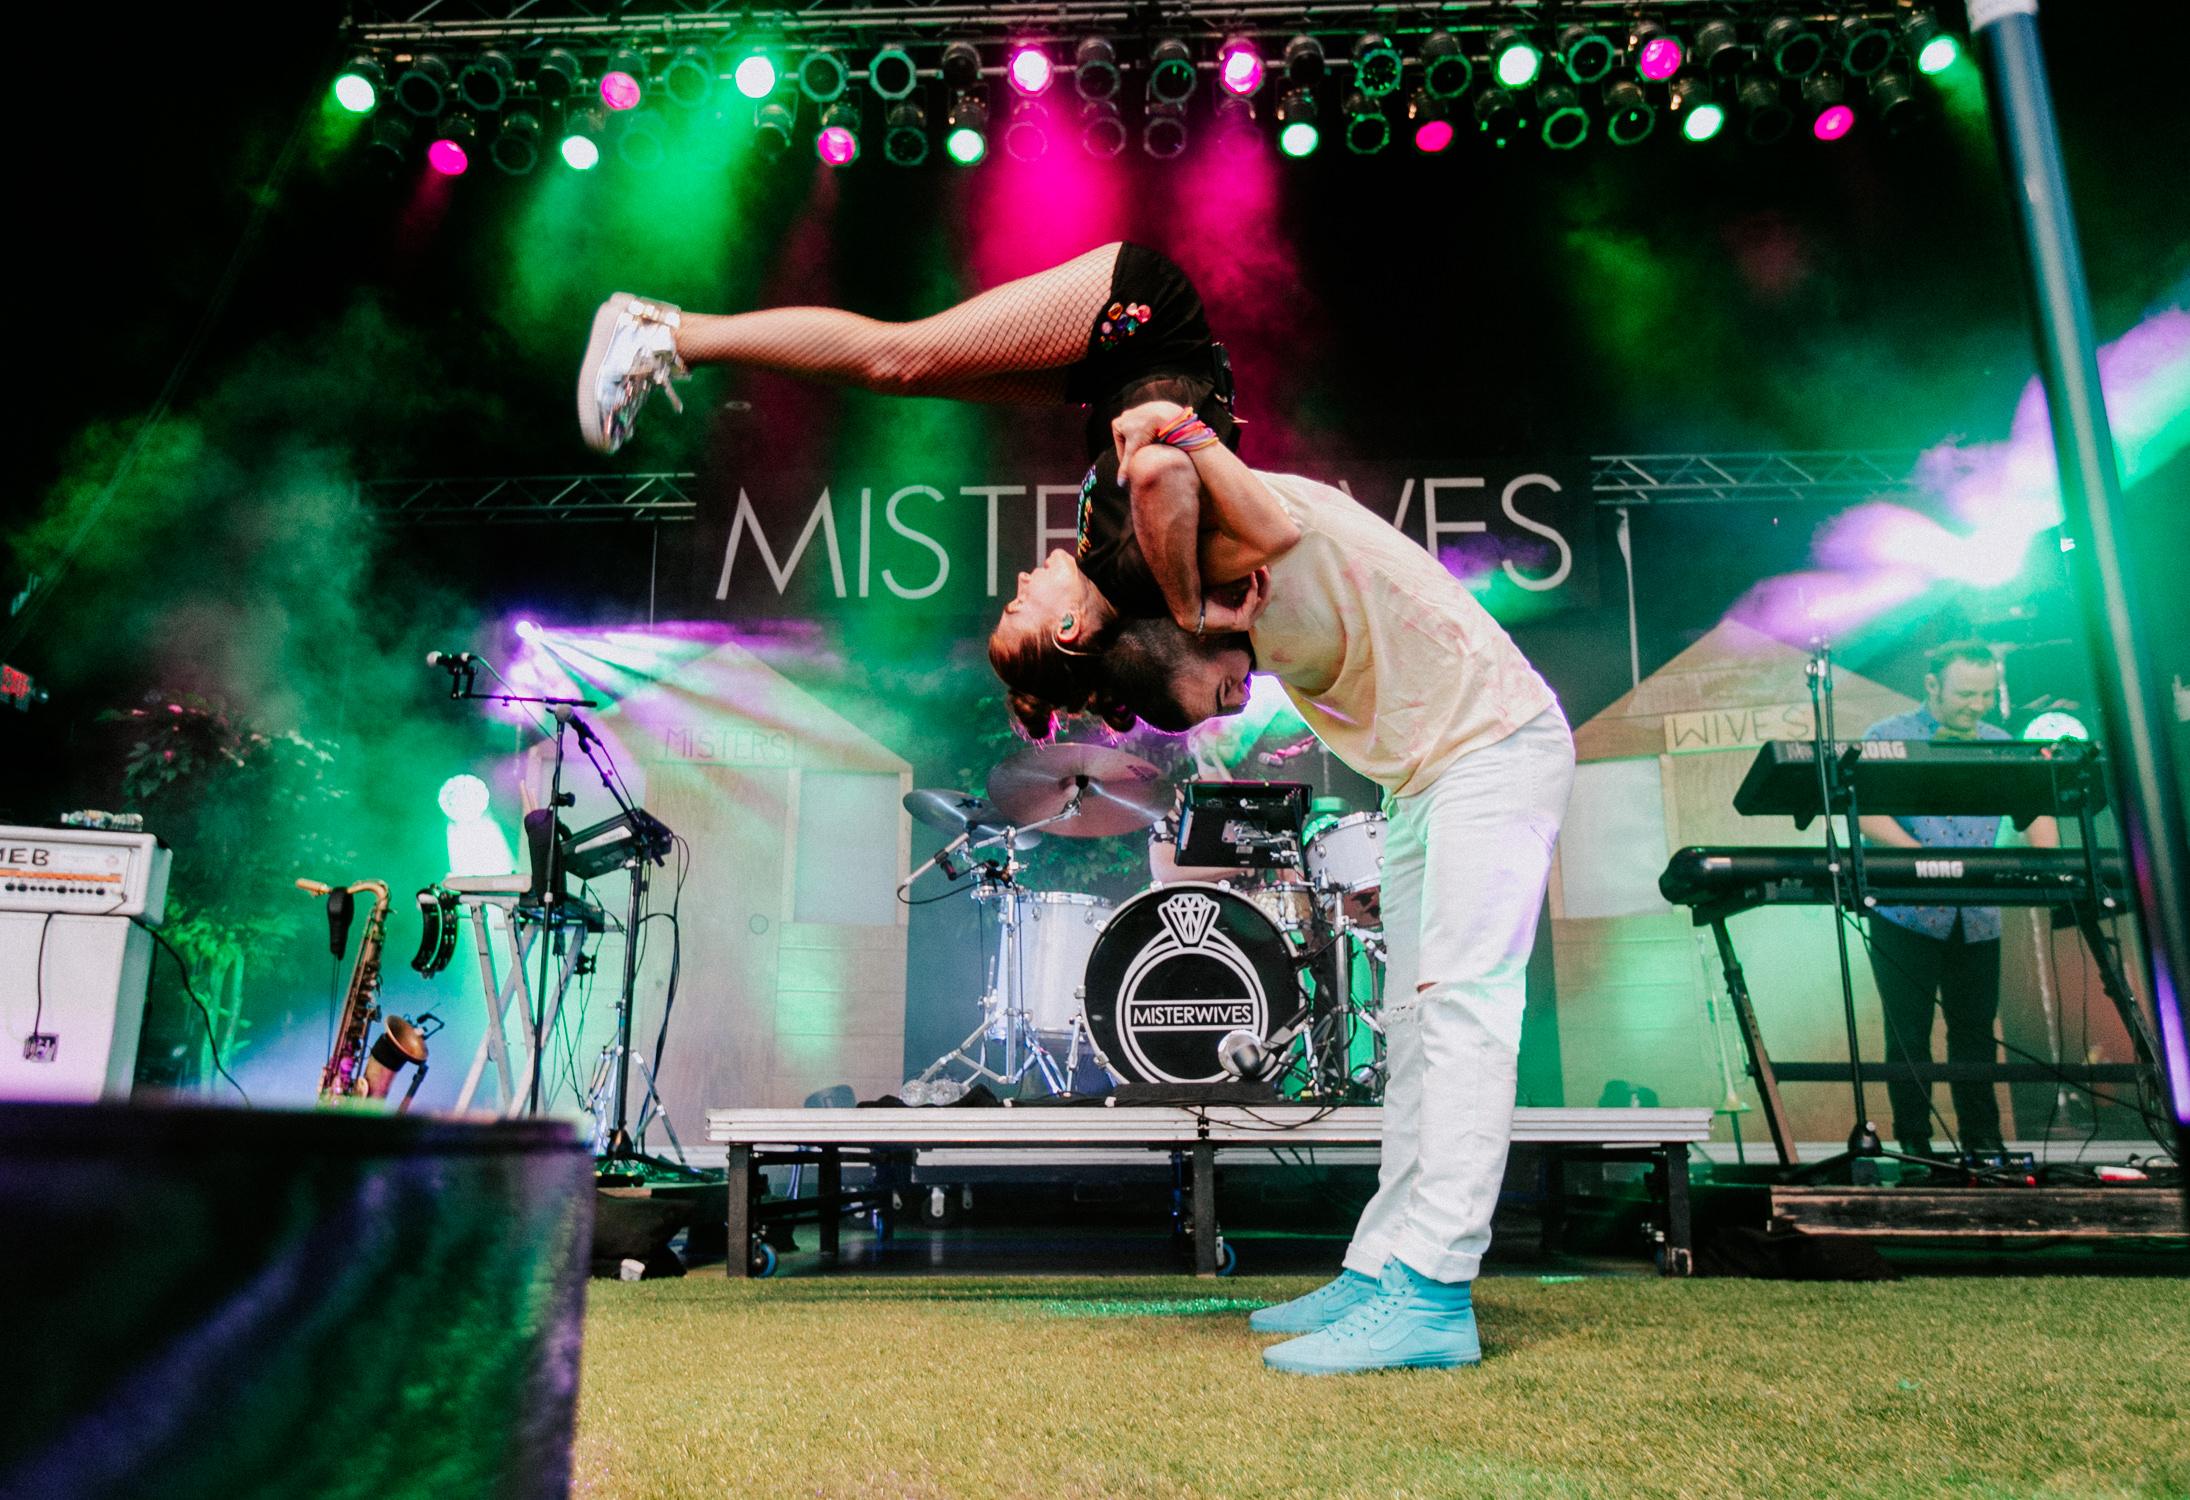 mandy-murph-backflip-misterwives-concert-AnnaLeeMedia